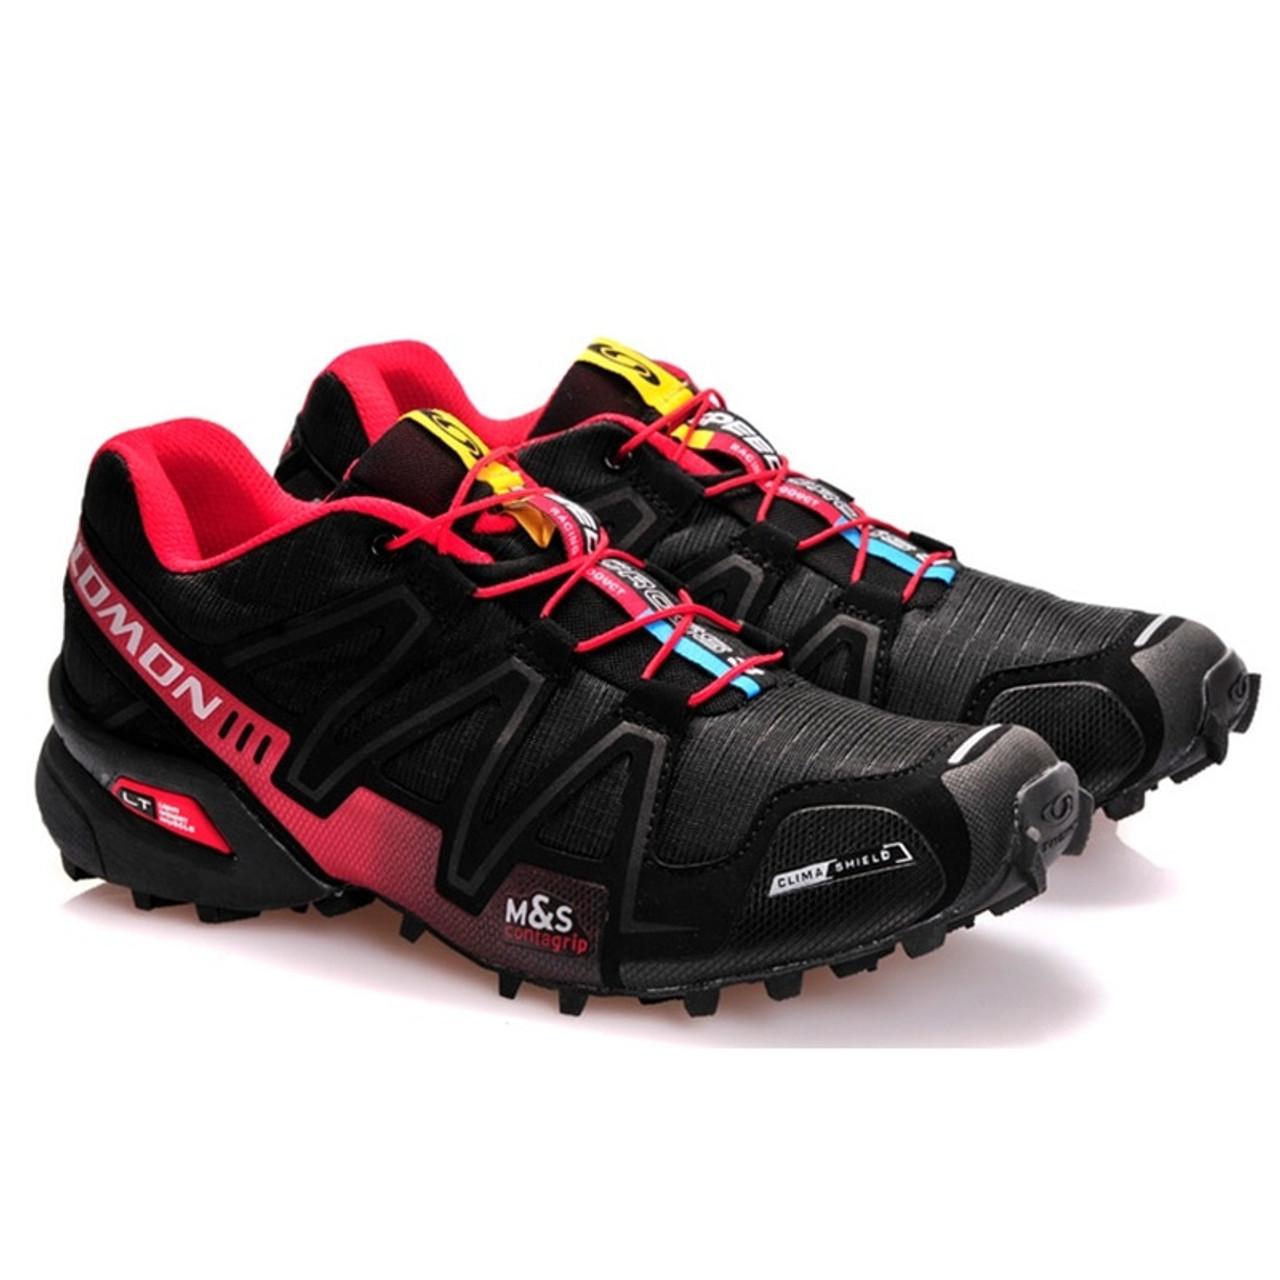 acheter pas cher f847b 8d5f2 Salomon Speed Cross 3 CS III Men running shoes Brand Sneakers Male Athletic  Sport Sneakers zapatillas Hombre Eur size 40-46